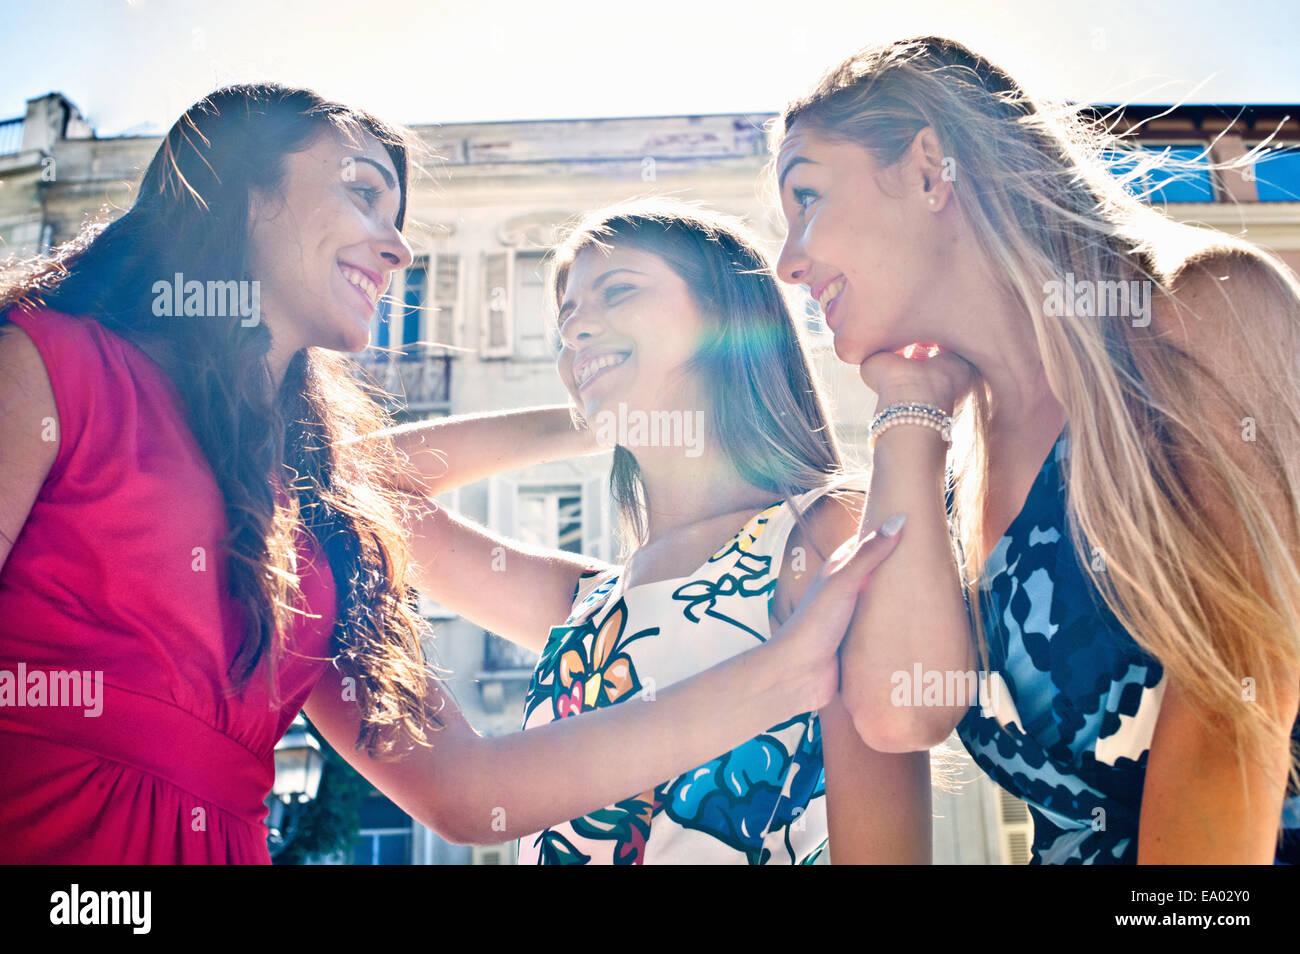 Trois jeunes femmes friends chatting on street, Cagliari, Sardaigne, Italie Photo Stock